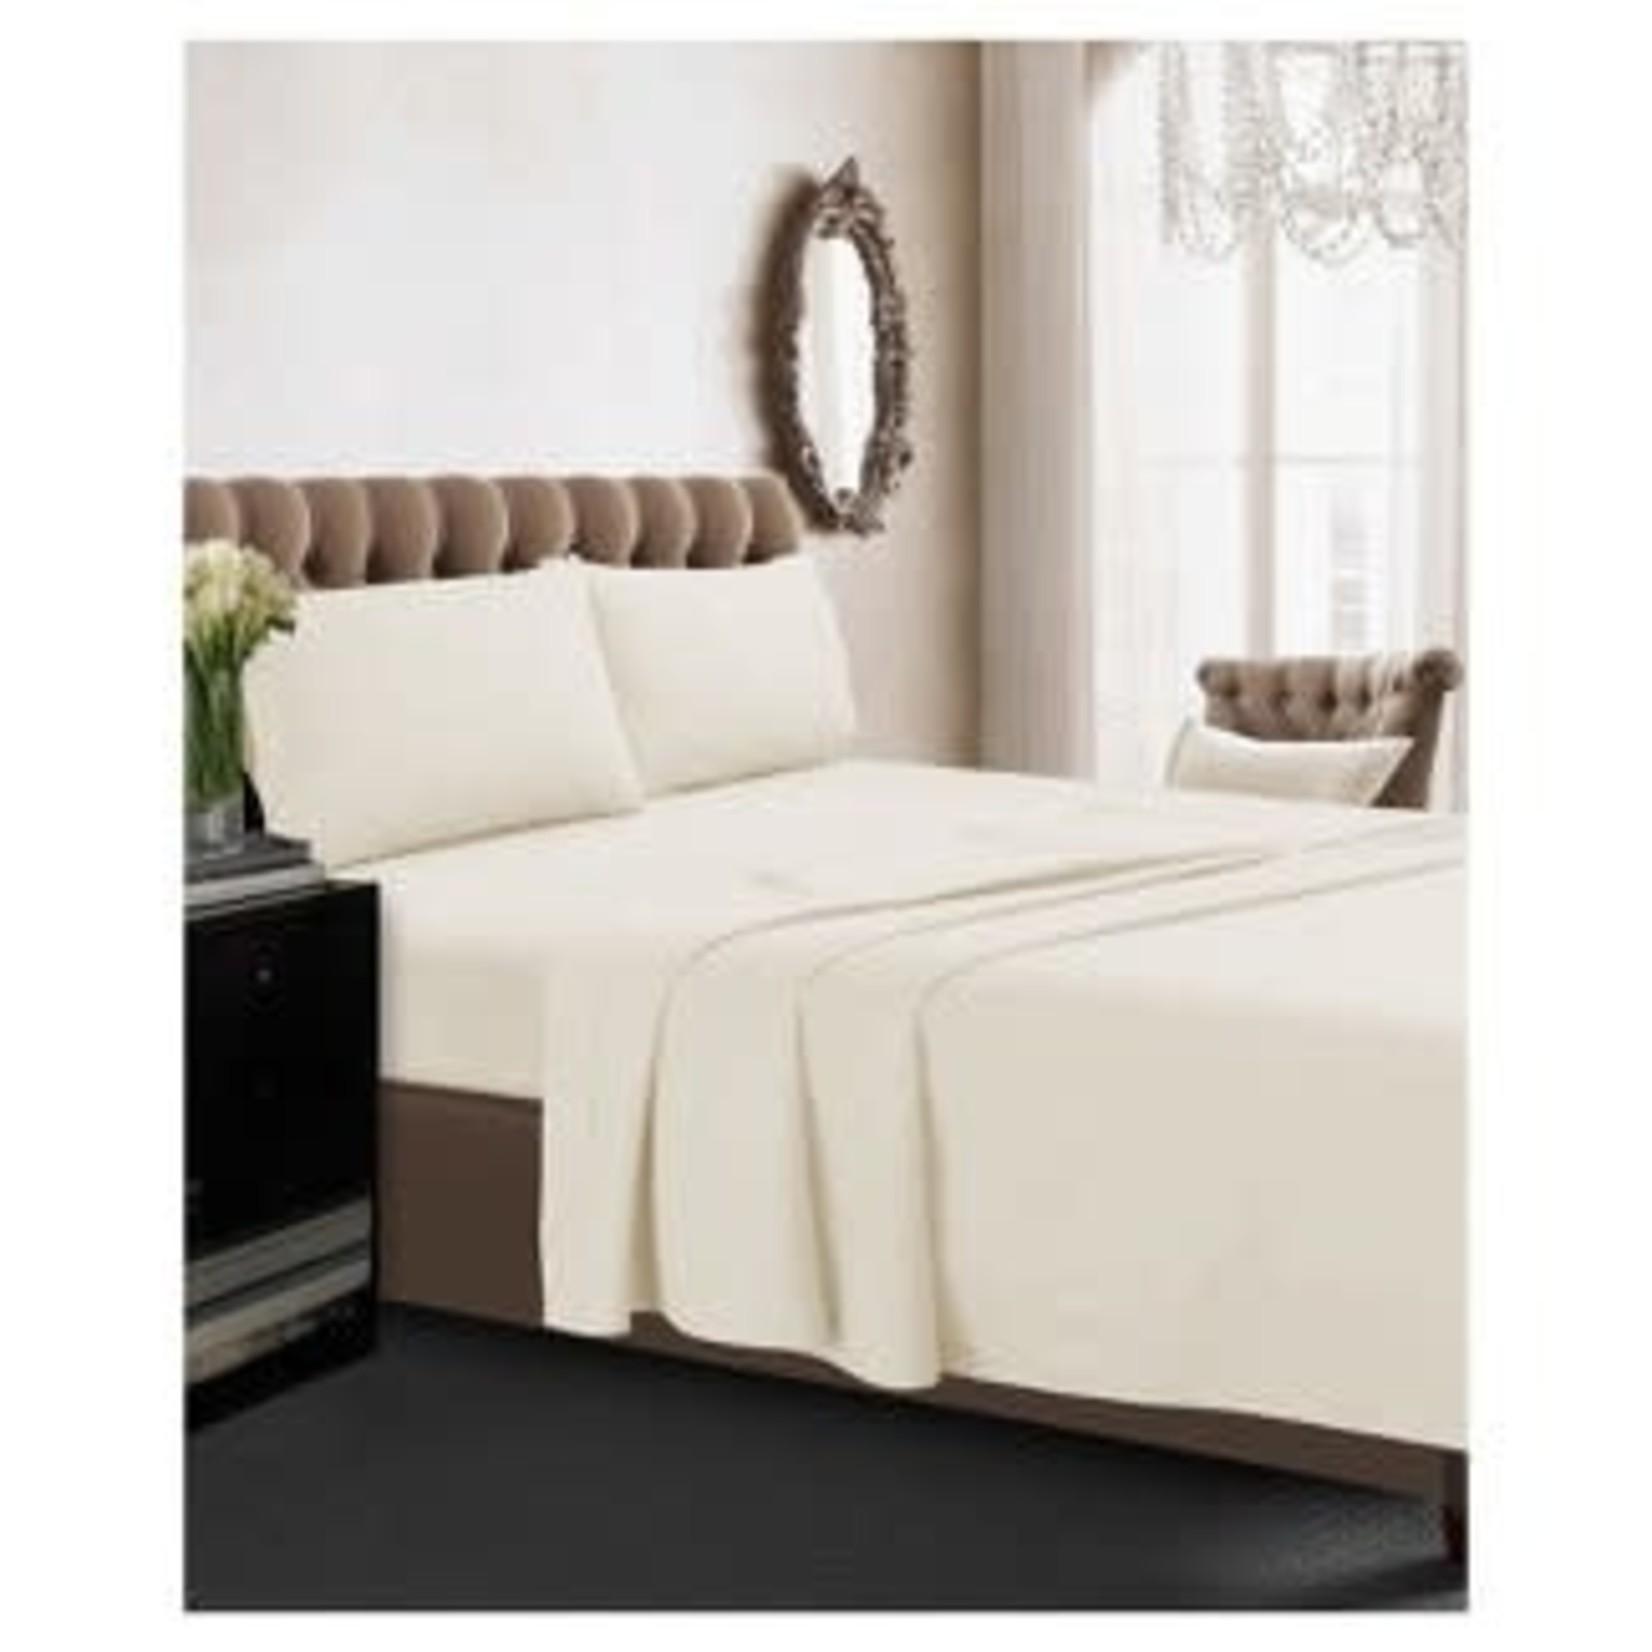 Tribeca Living | Long Staple Cotton Percale Deep Pocket Solid Sheet Set 350 TC-KING